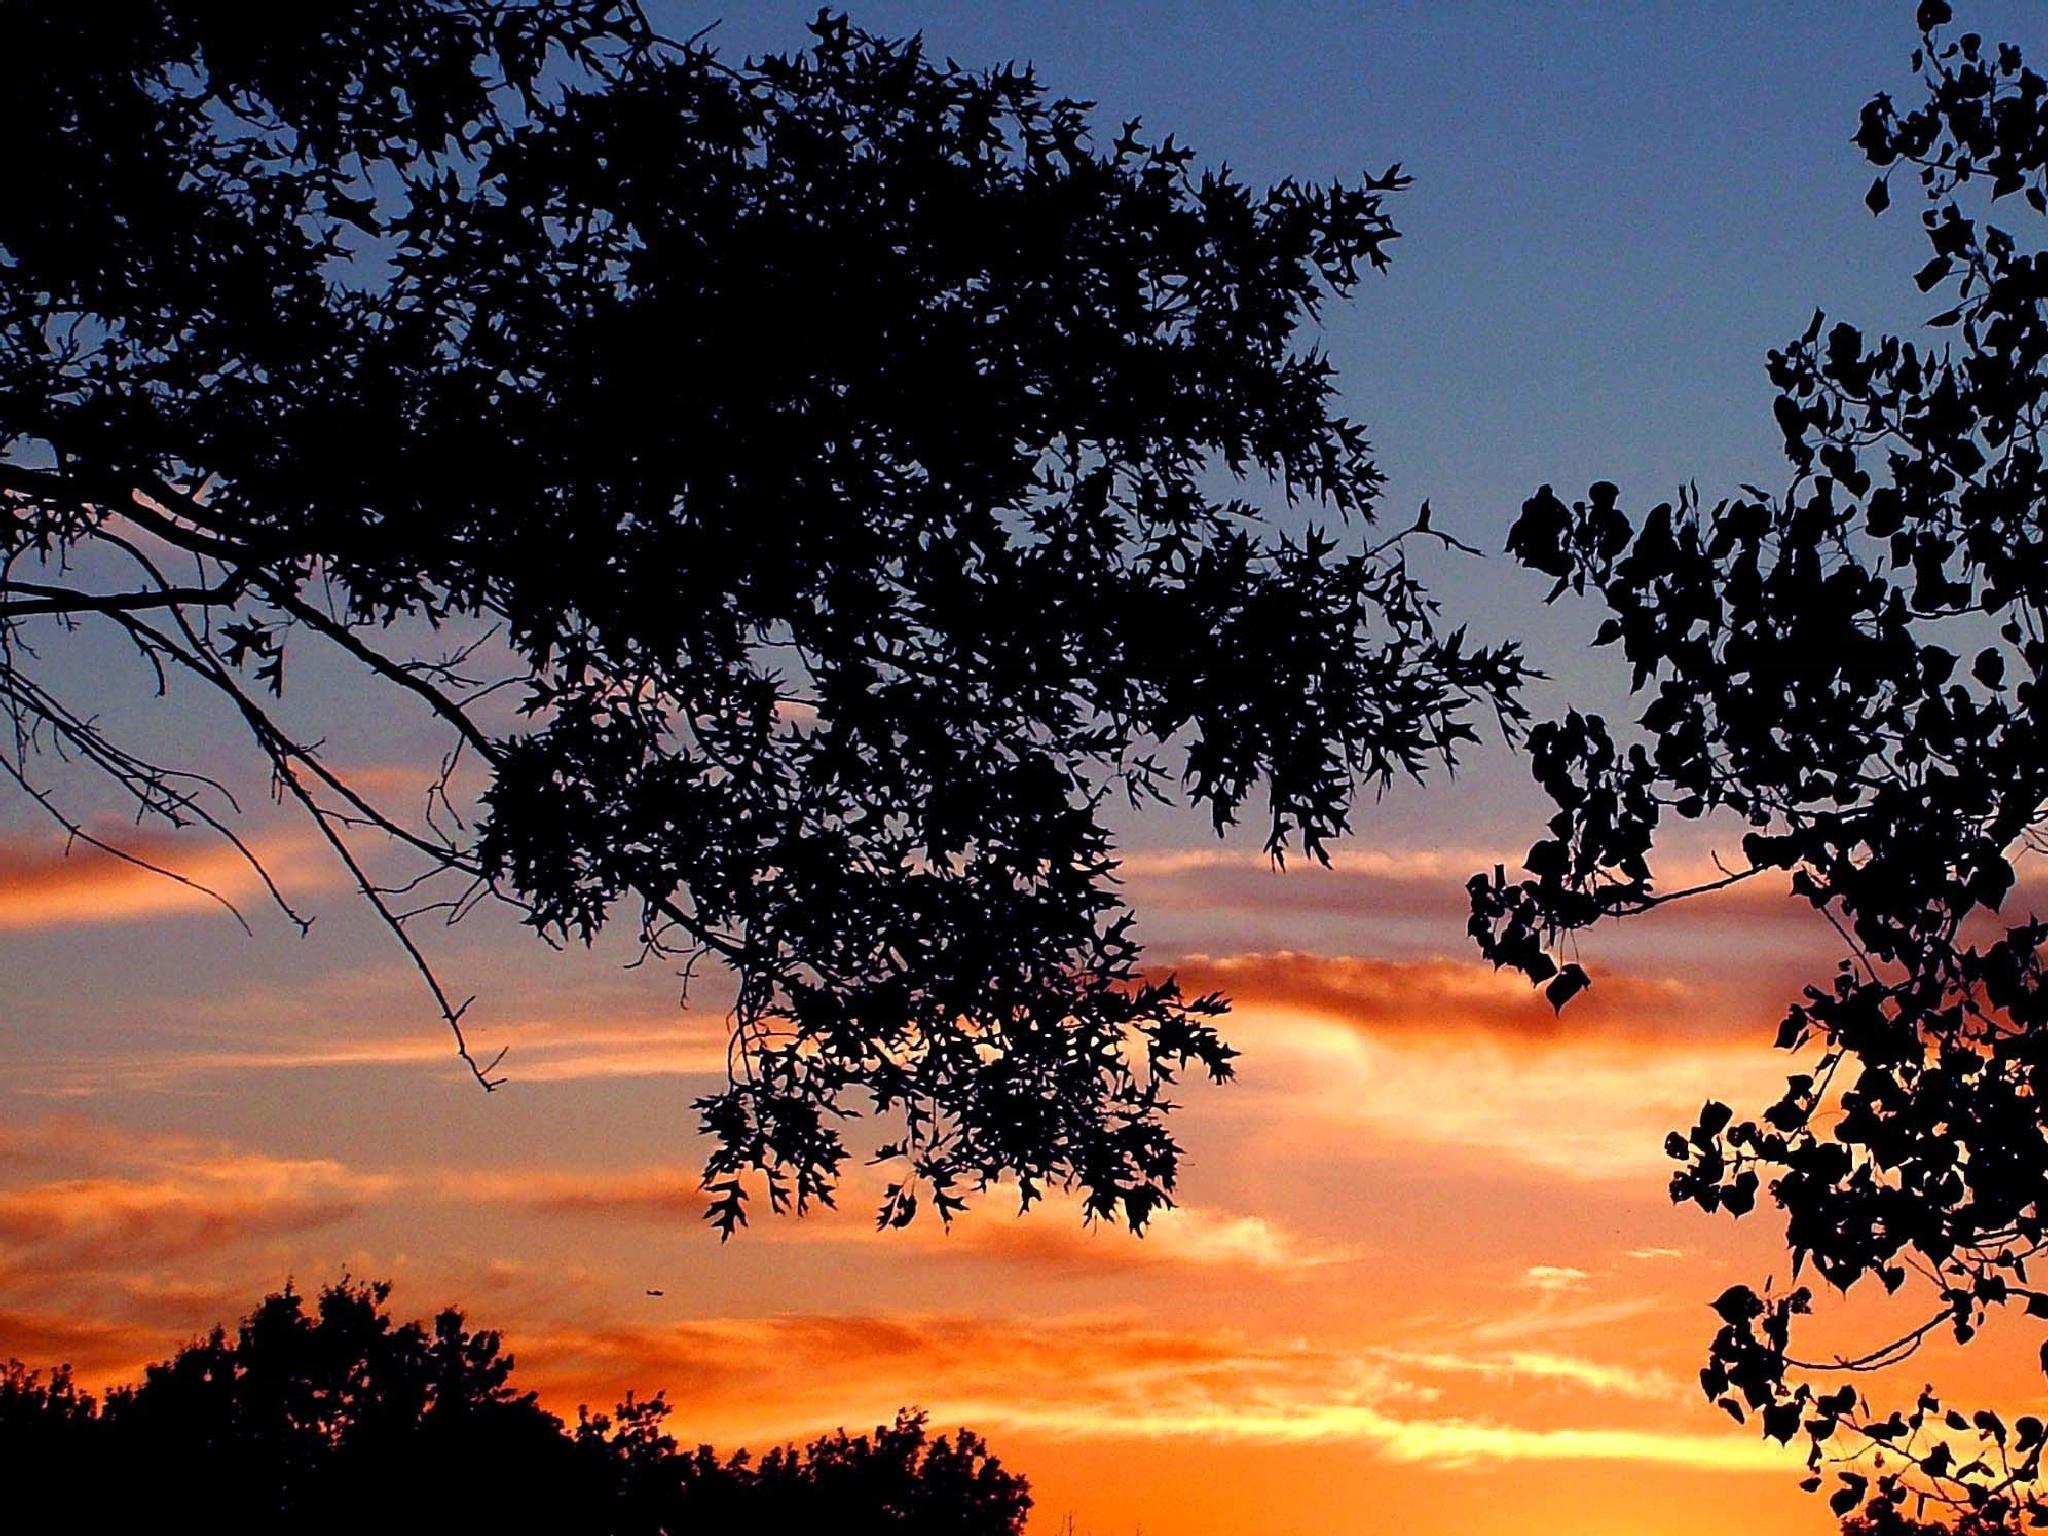 Rural Missouri Sunset by Lorenzo (Larry) Jonree